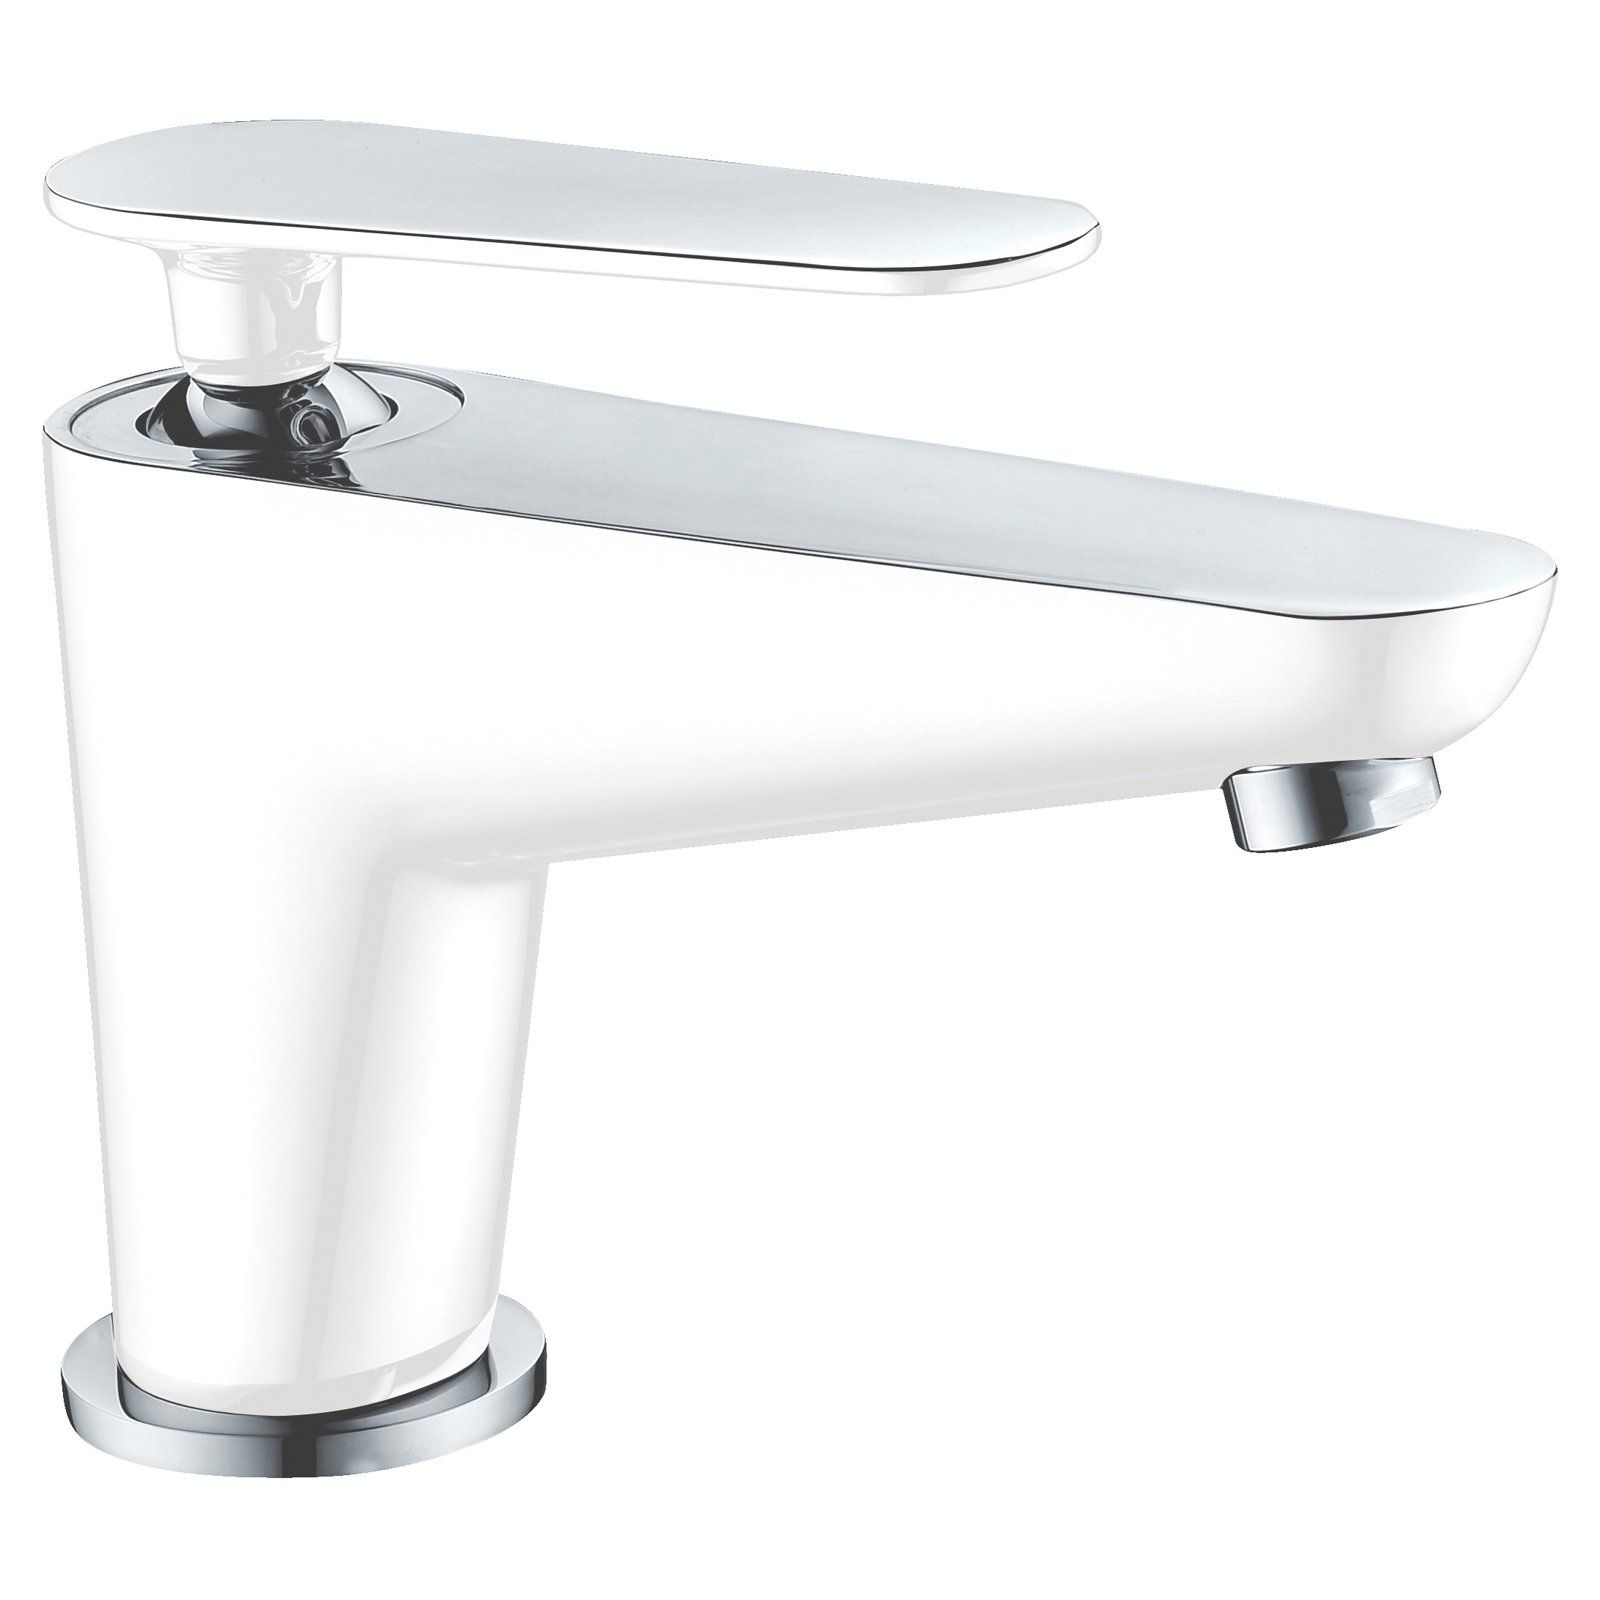 Dawn Ab27 1600c Single Lever Bathroom Sink Faucet Sink Faucets